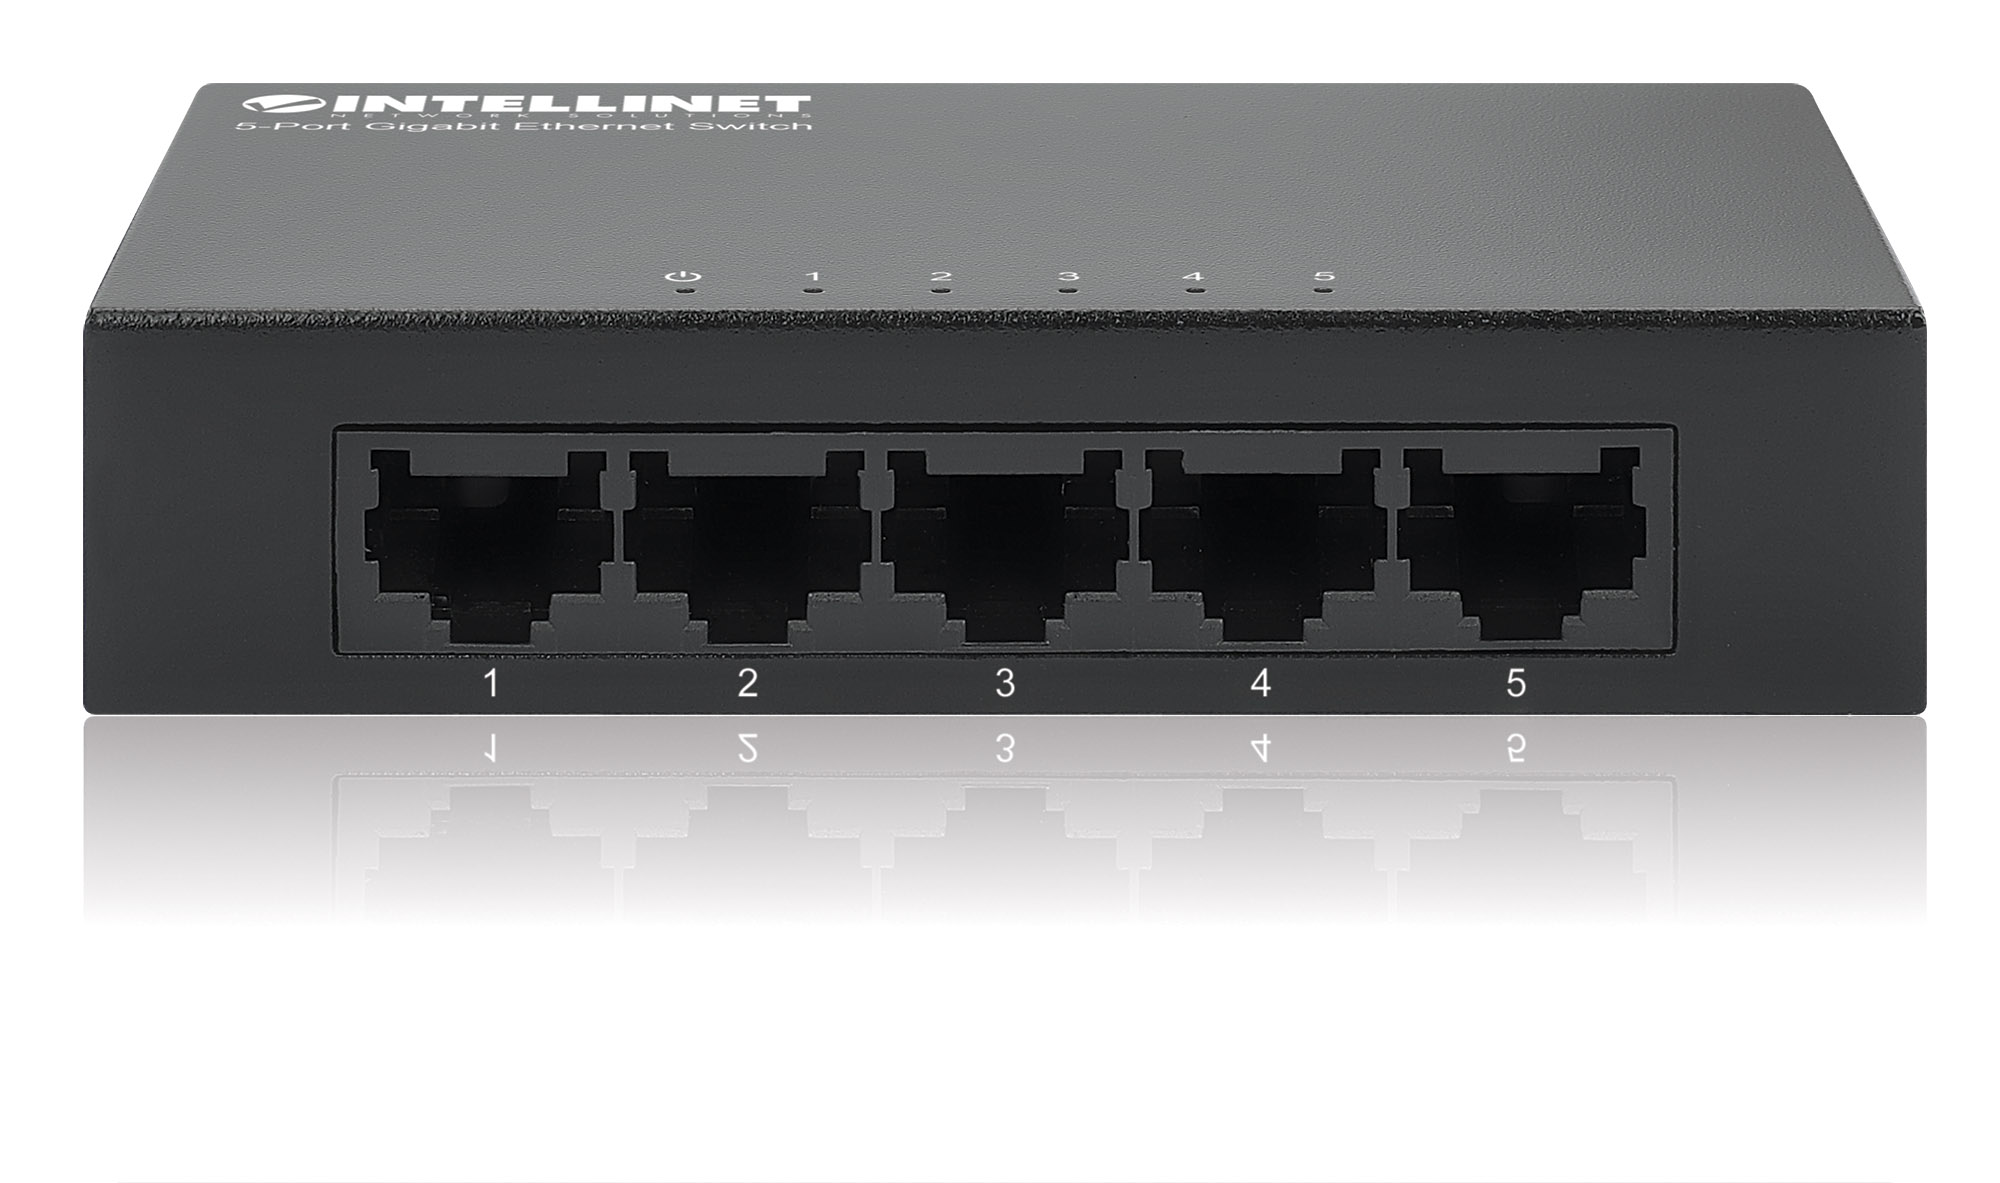 5-Port Gigabit Ethernet Switch